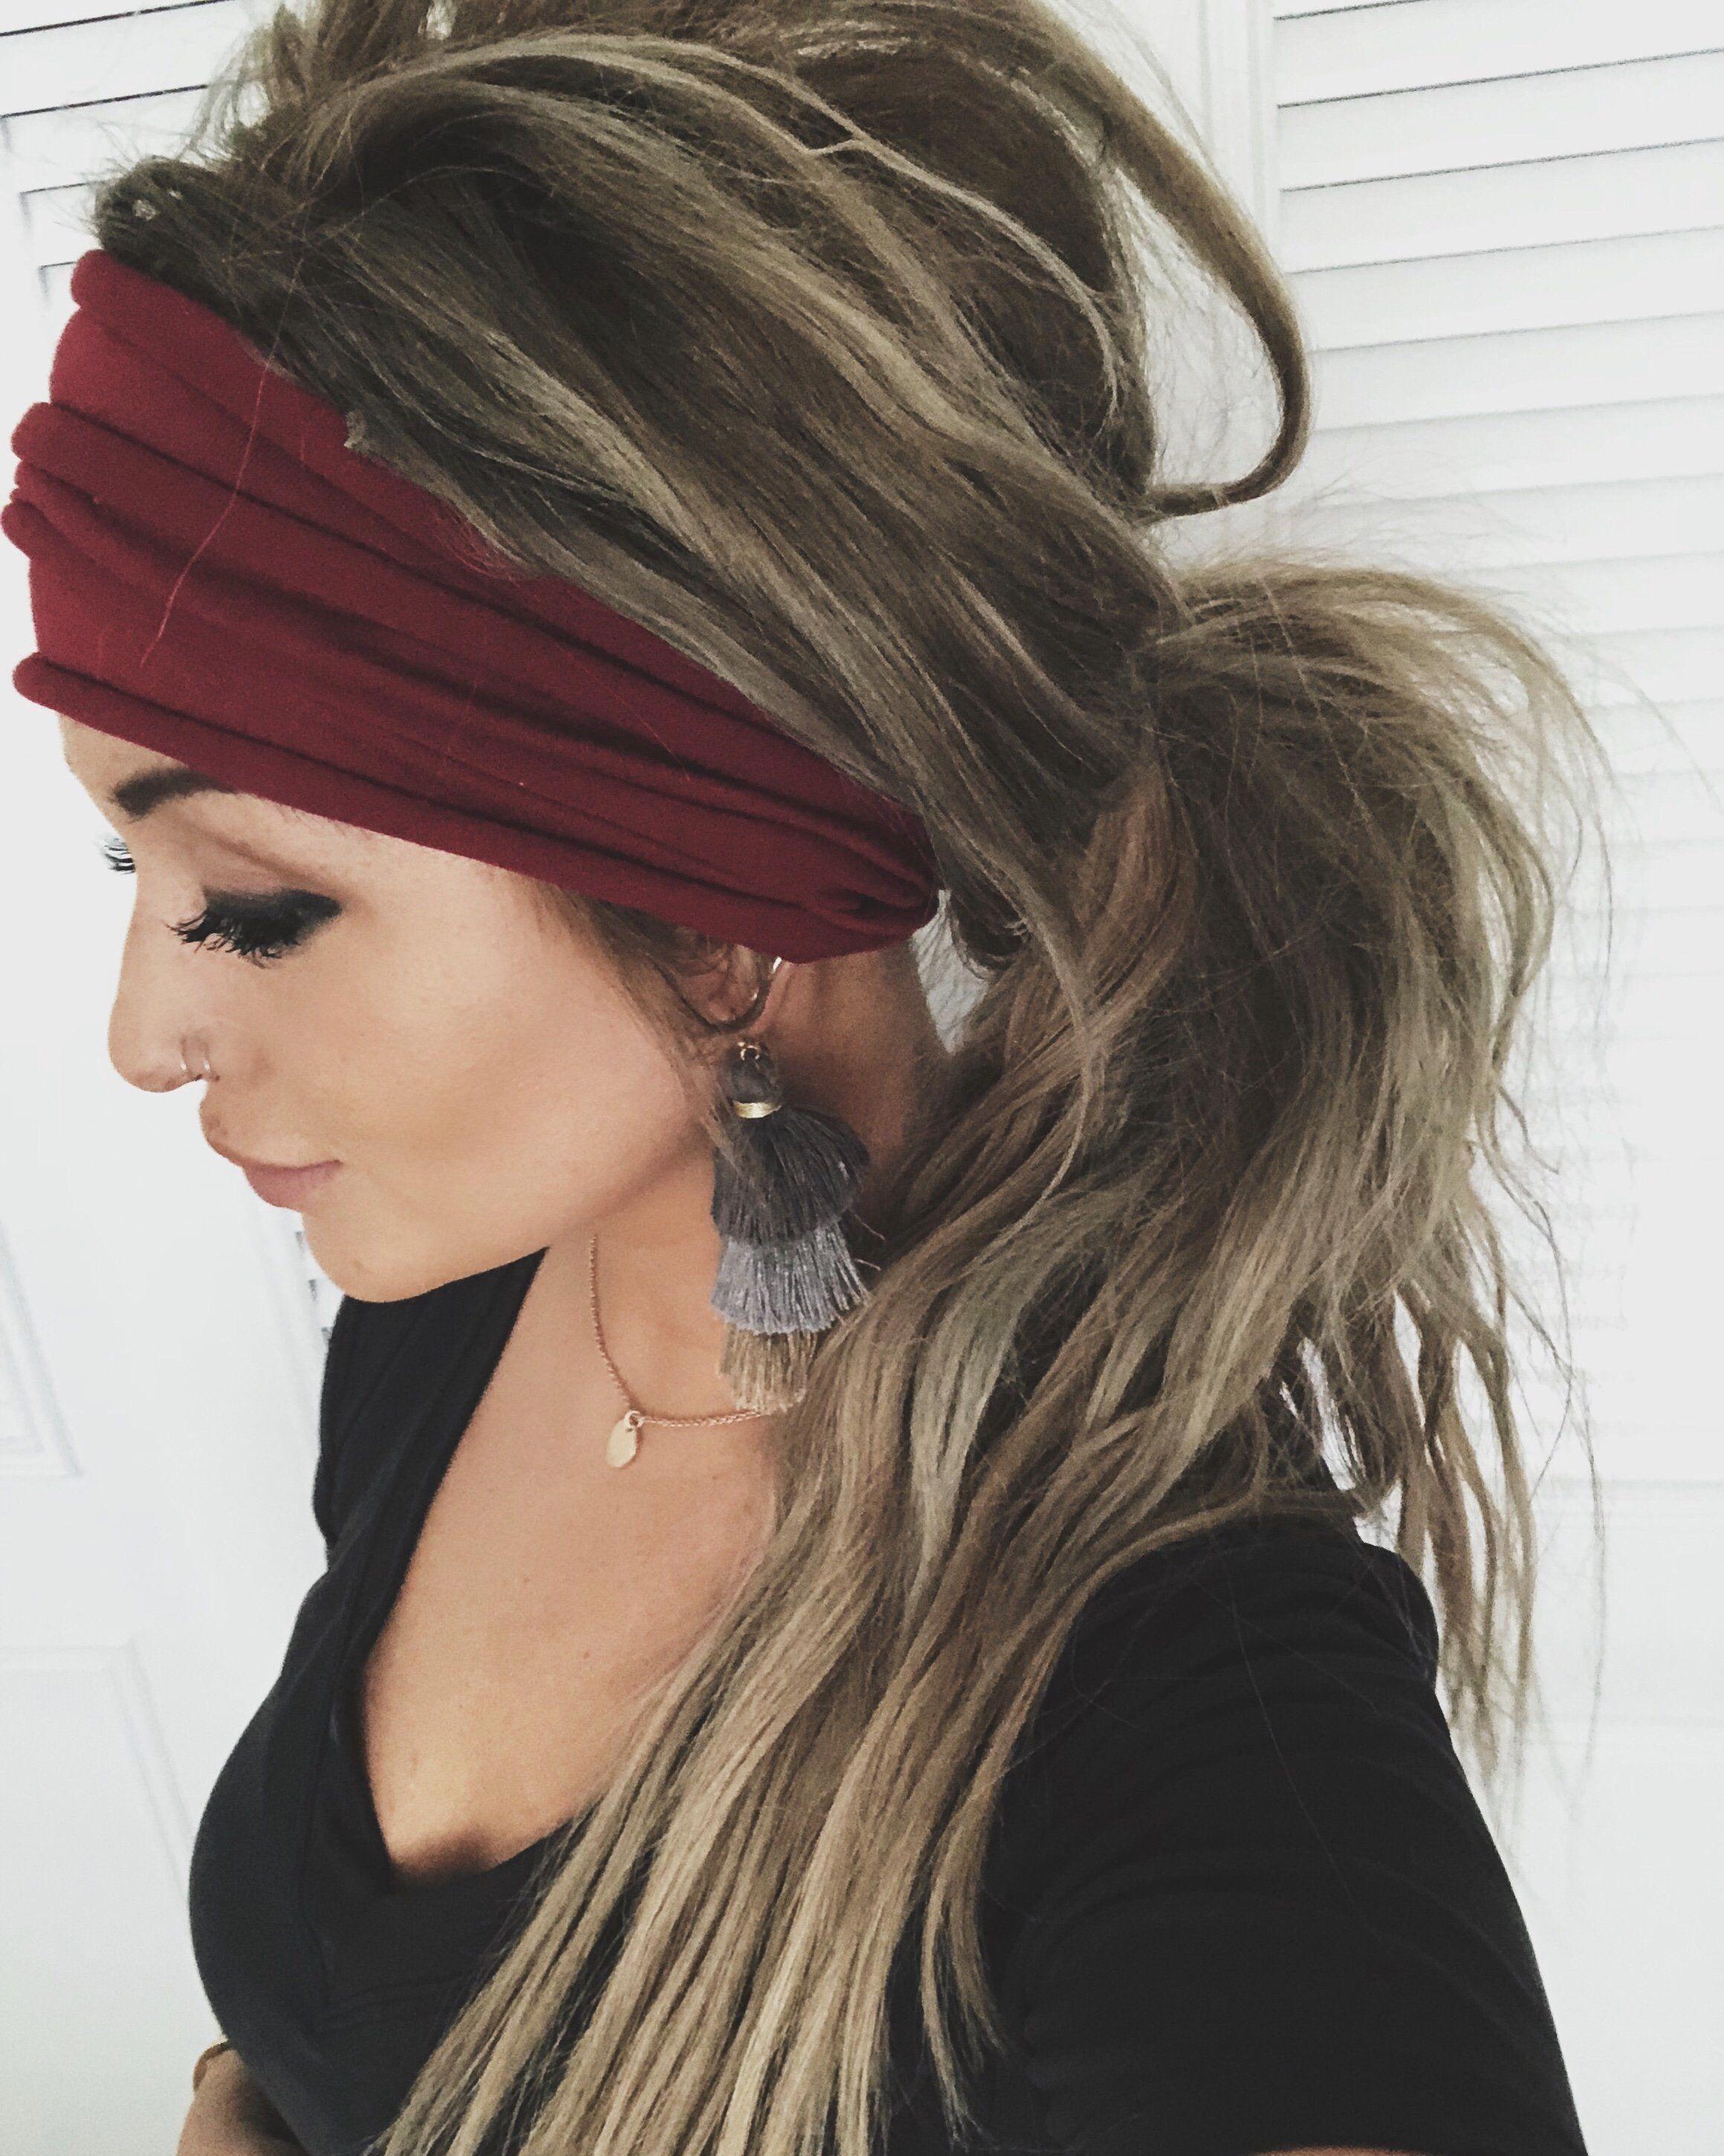 17 Trendiest Thick Headband Hairstyles Beautiful Hippie Headband Hairstyles Headband Hairstyles Scarf Hairstyles